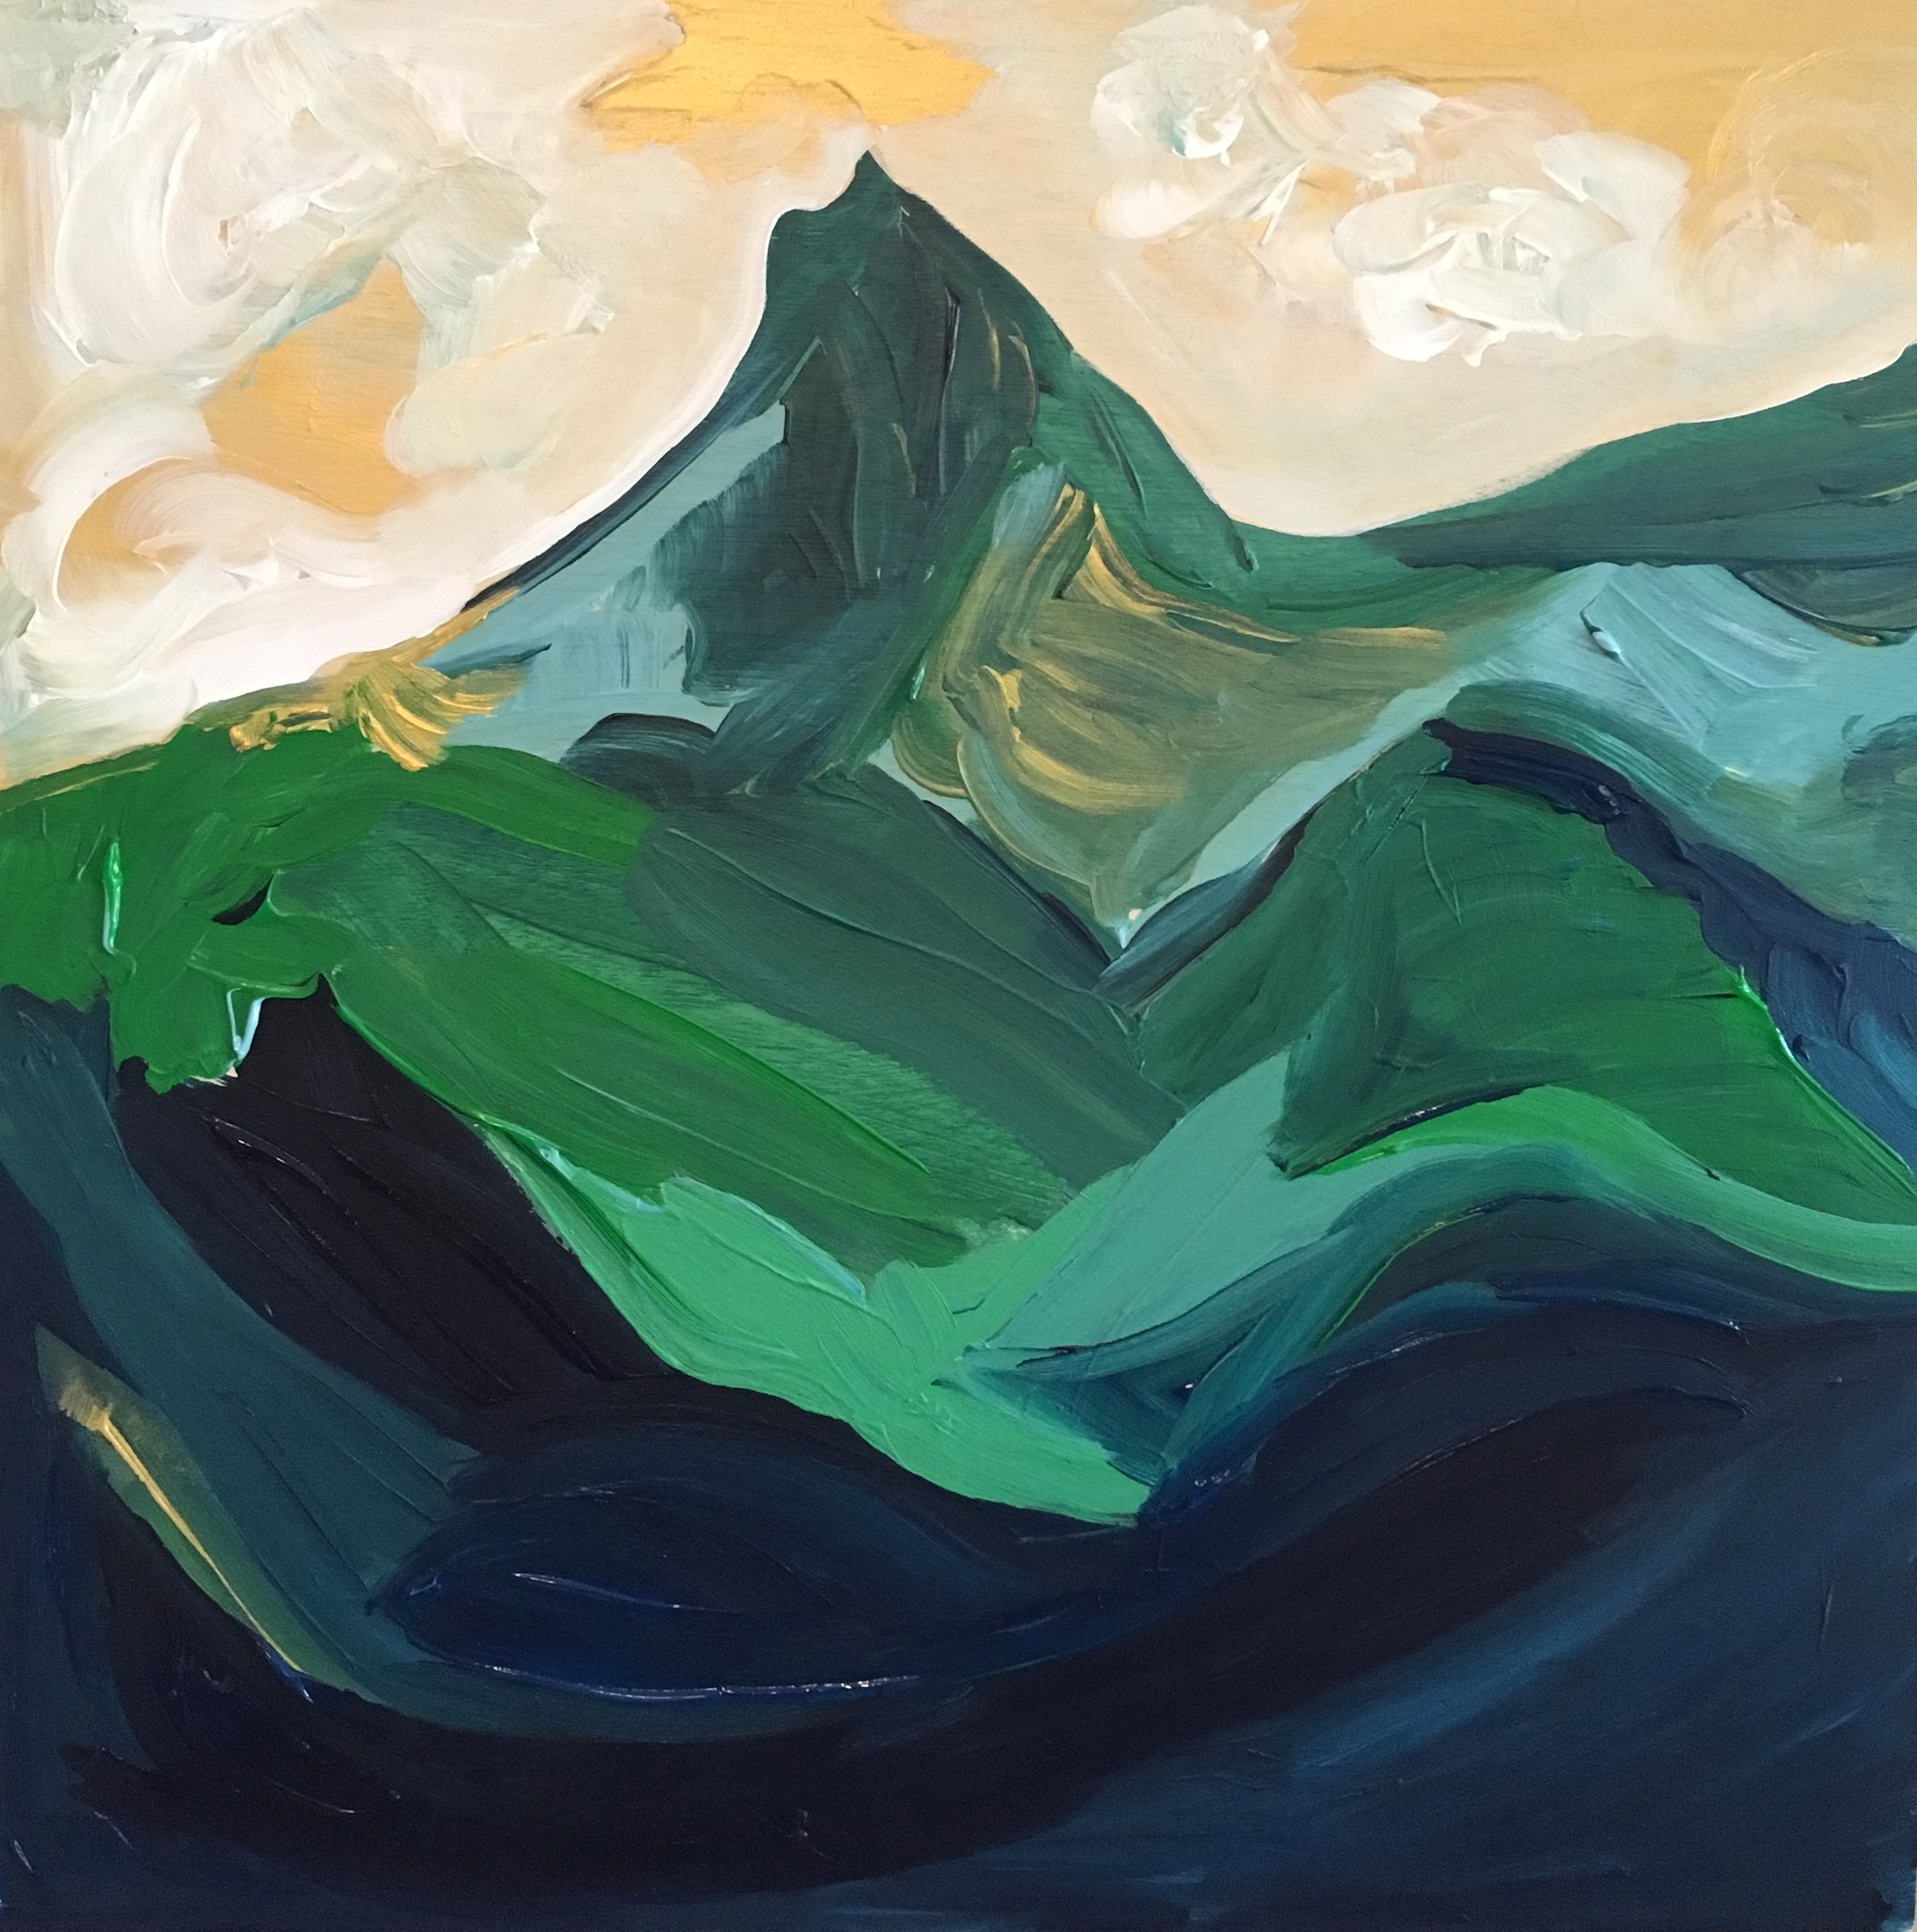 Rendering of Ansel Adams: Mount Clarence King, Southern Sierra